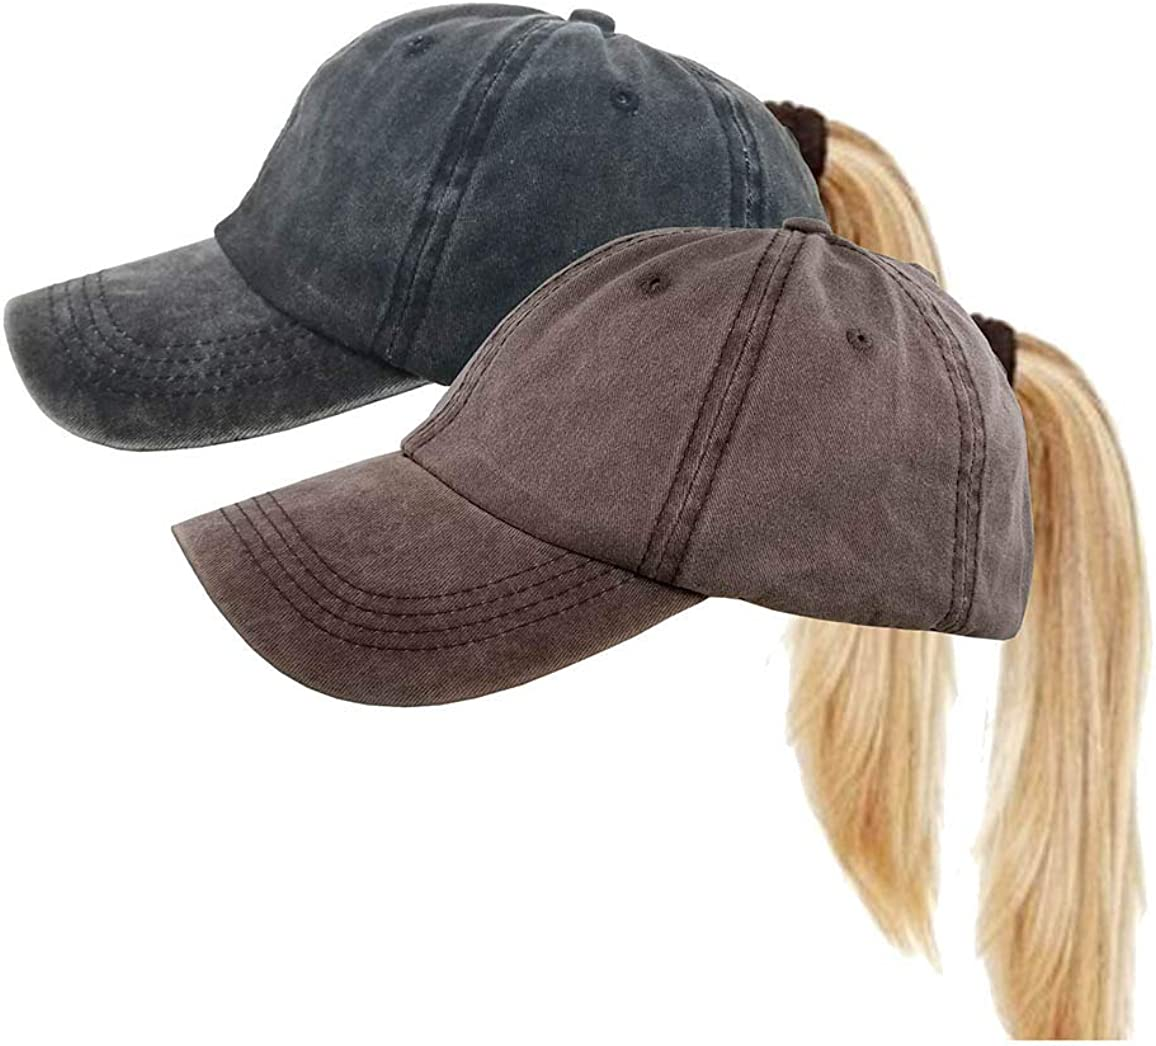 Washed Ponytail Hats Pony...